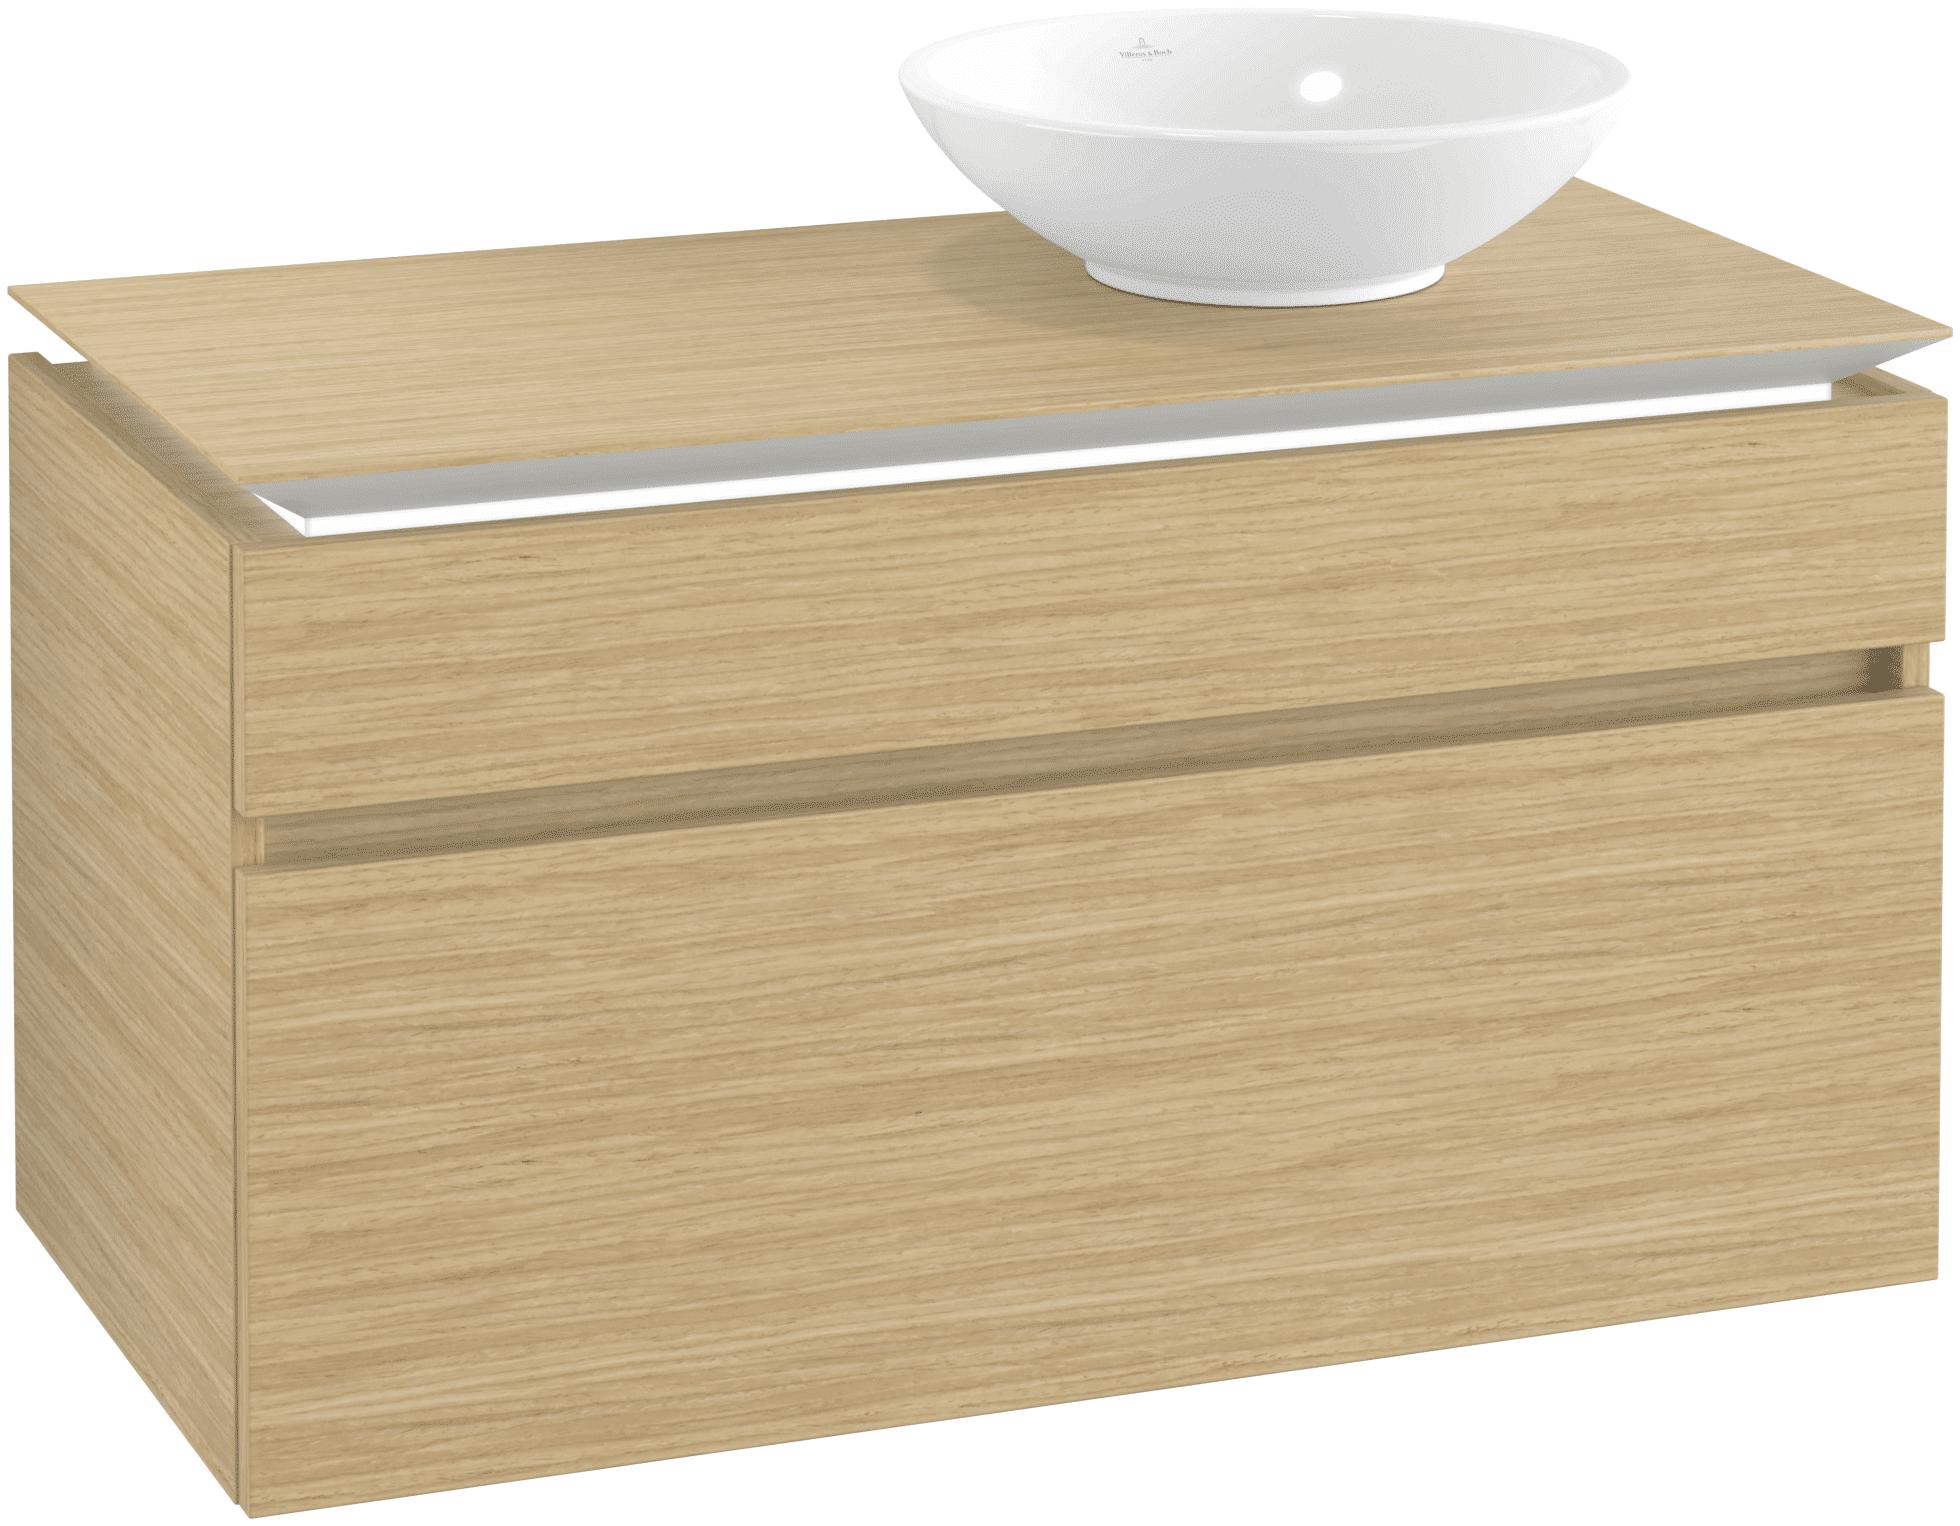 Villeroy & Boch Villeroy & Boch Legato - Meuble sous lavabo with 2 drawers & 1 cut-out right 1000 x 550 x 500mm nordic oak